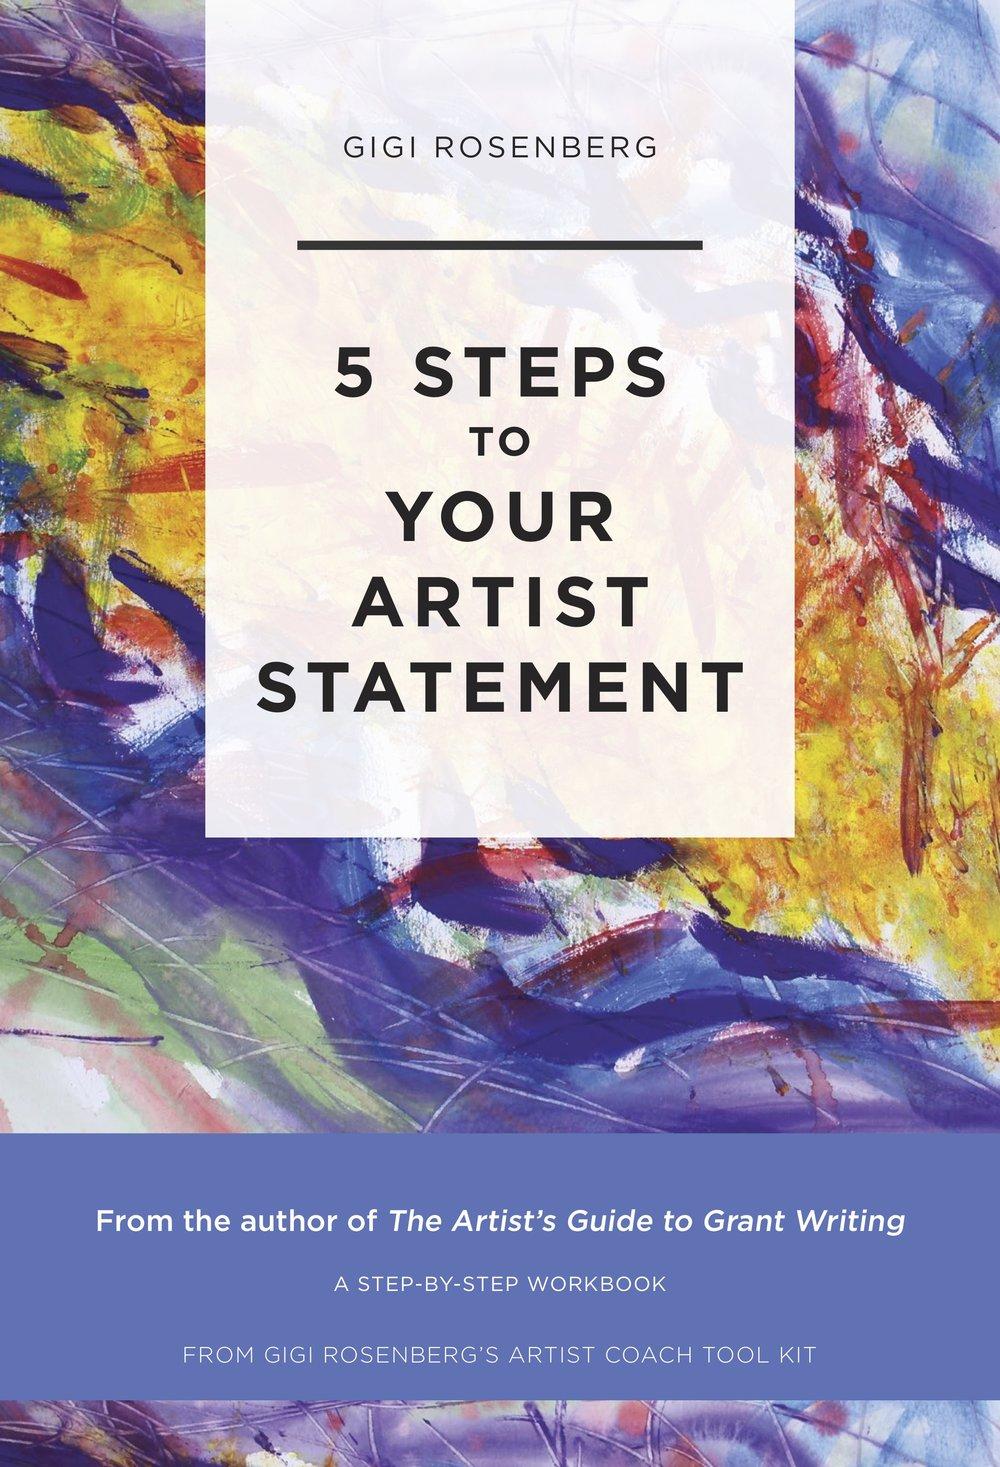 5_Steps_To_Your_Artist_Statement_By_Gigi_Rosenberg.jpg